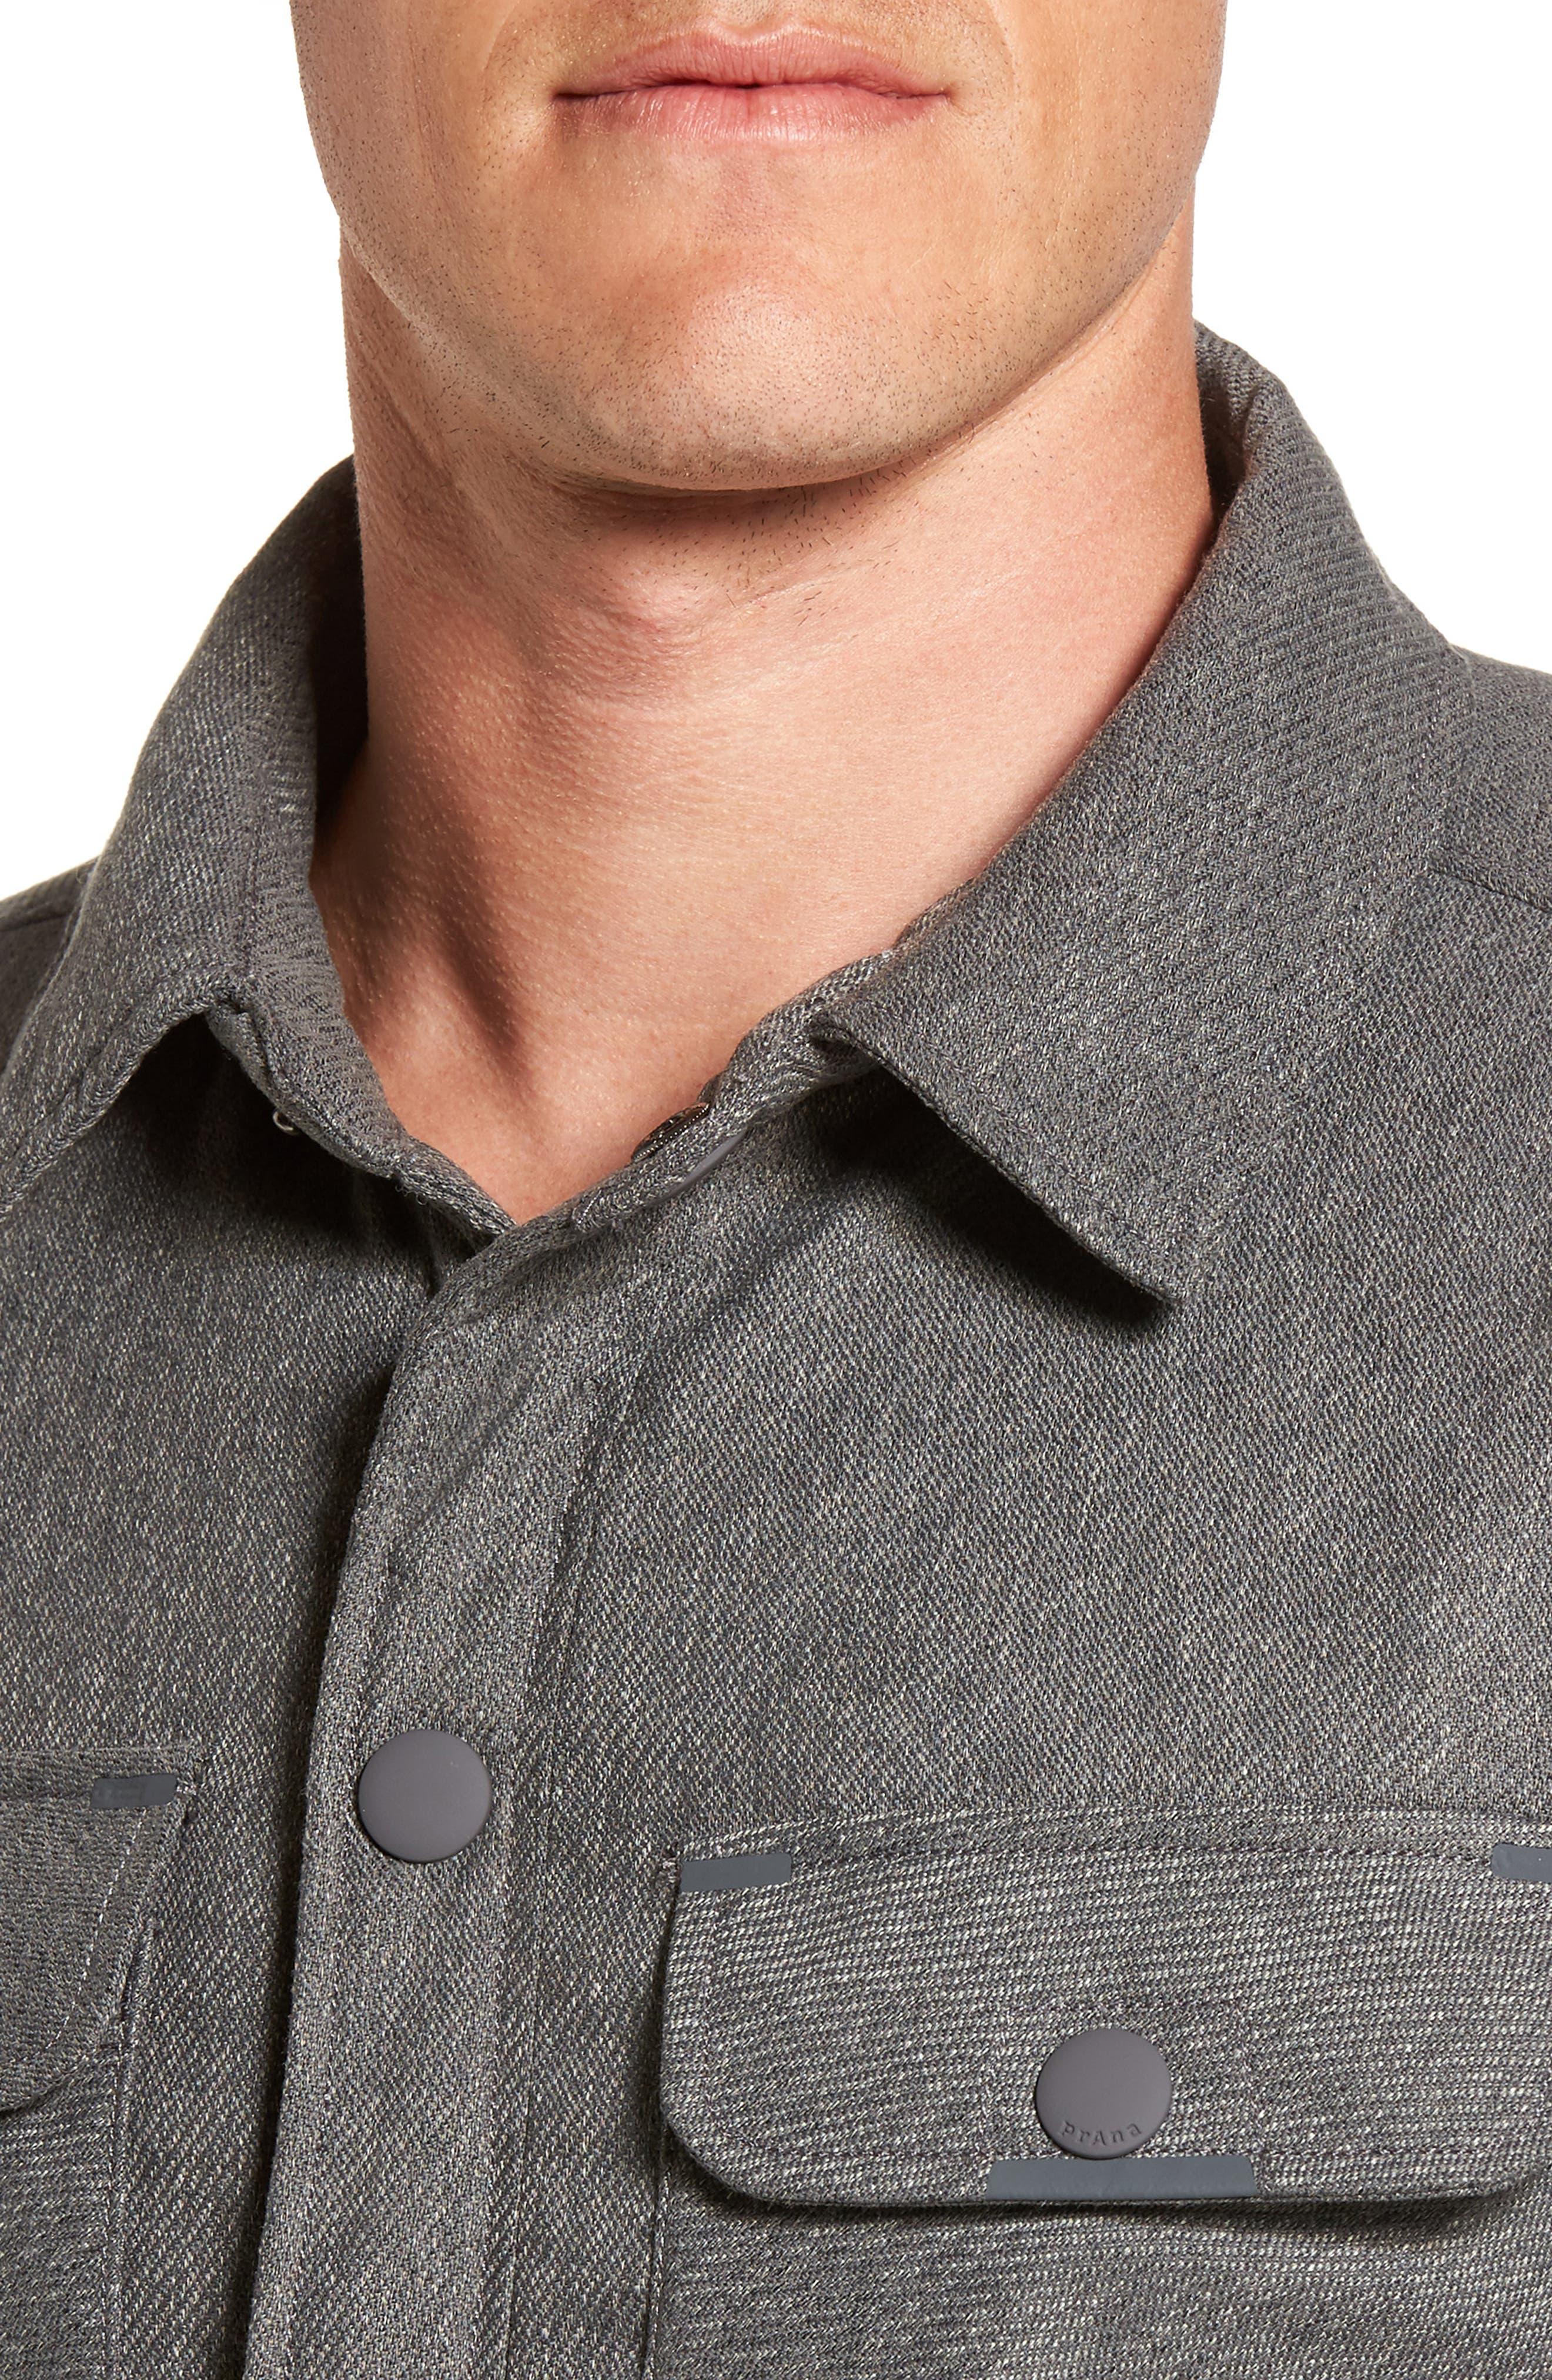 Showdown Shirt Jacket,                             Alternate thumbnail 4, color,                             020